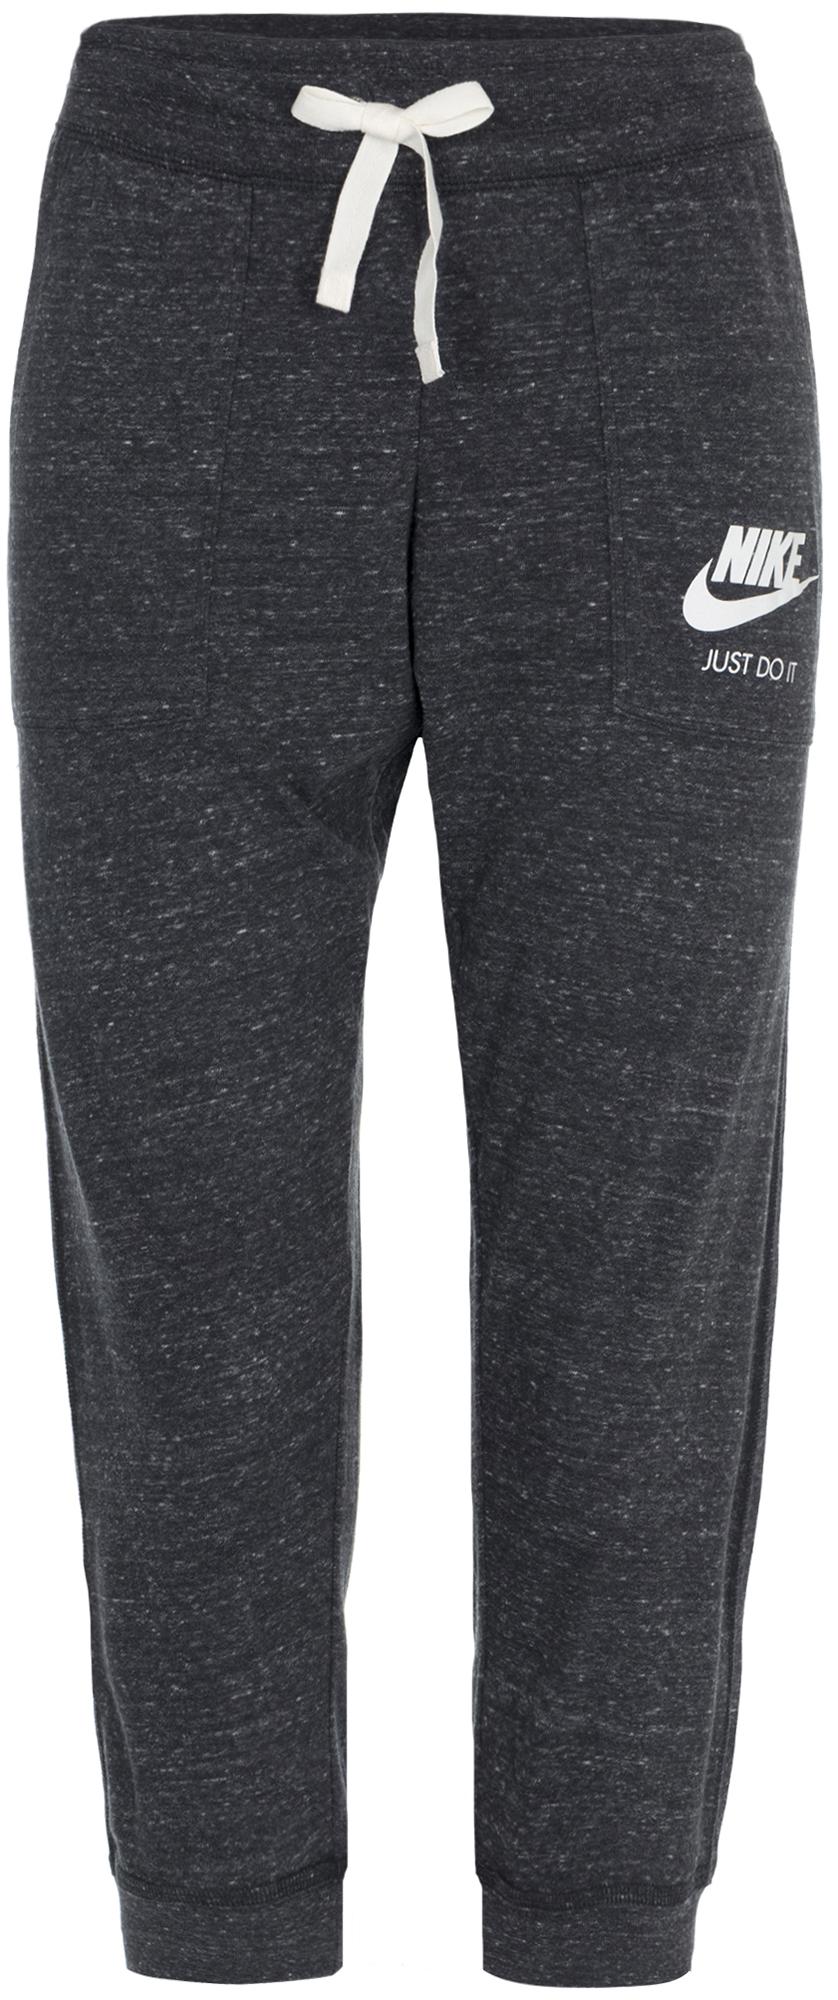 Nike Бриджи женские Nike Sportswear Vintage shoes nike vintage